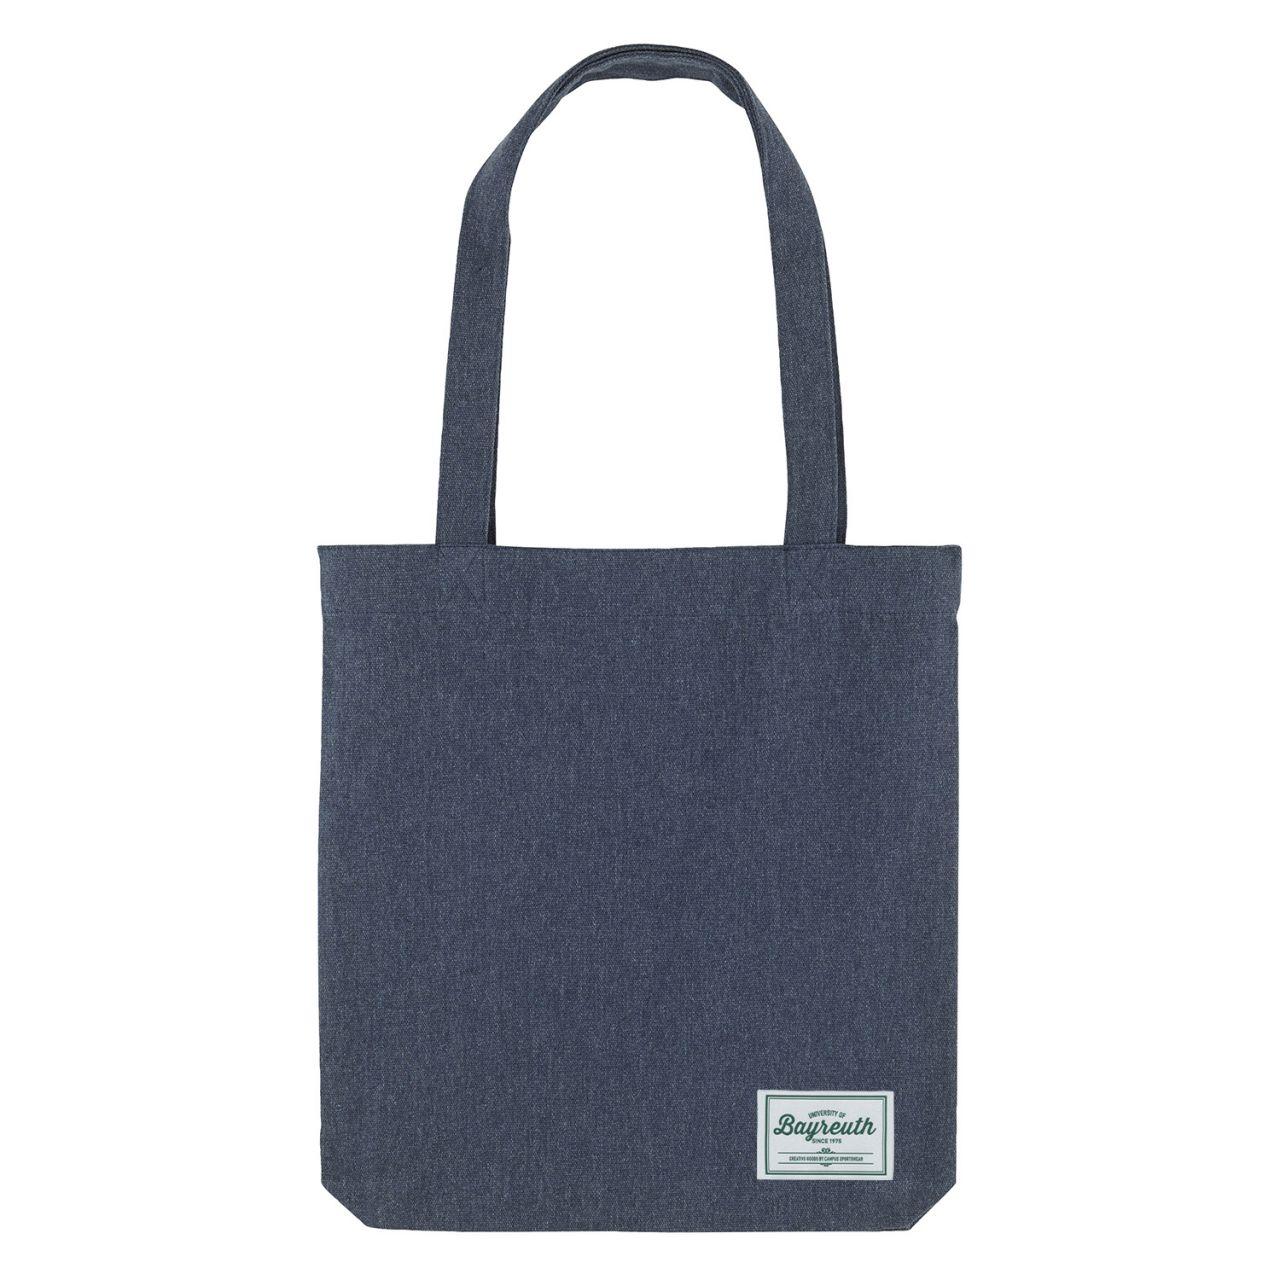 Organic Tote Bag, navy, label